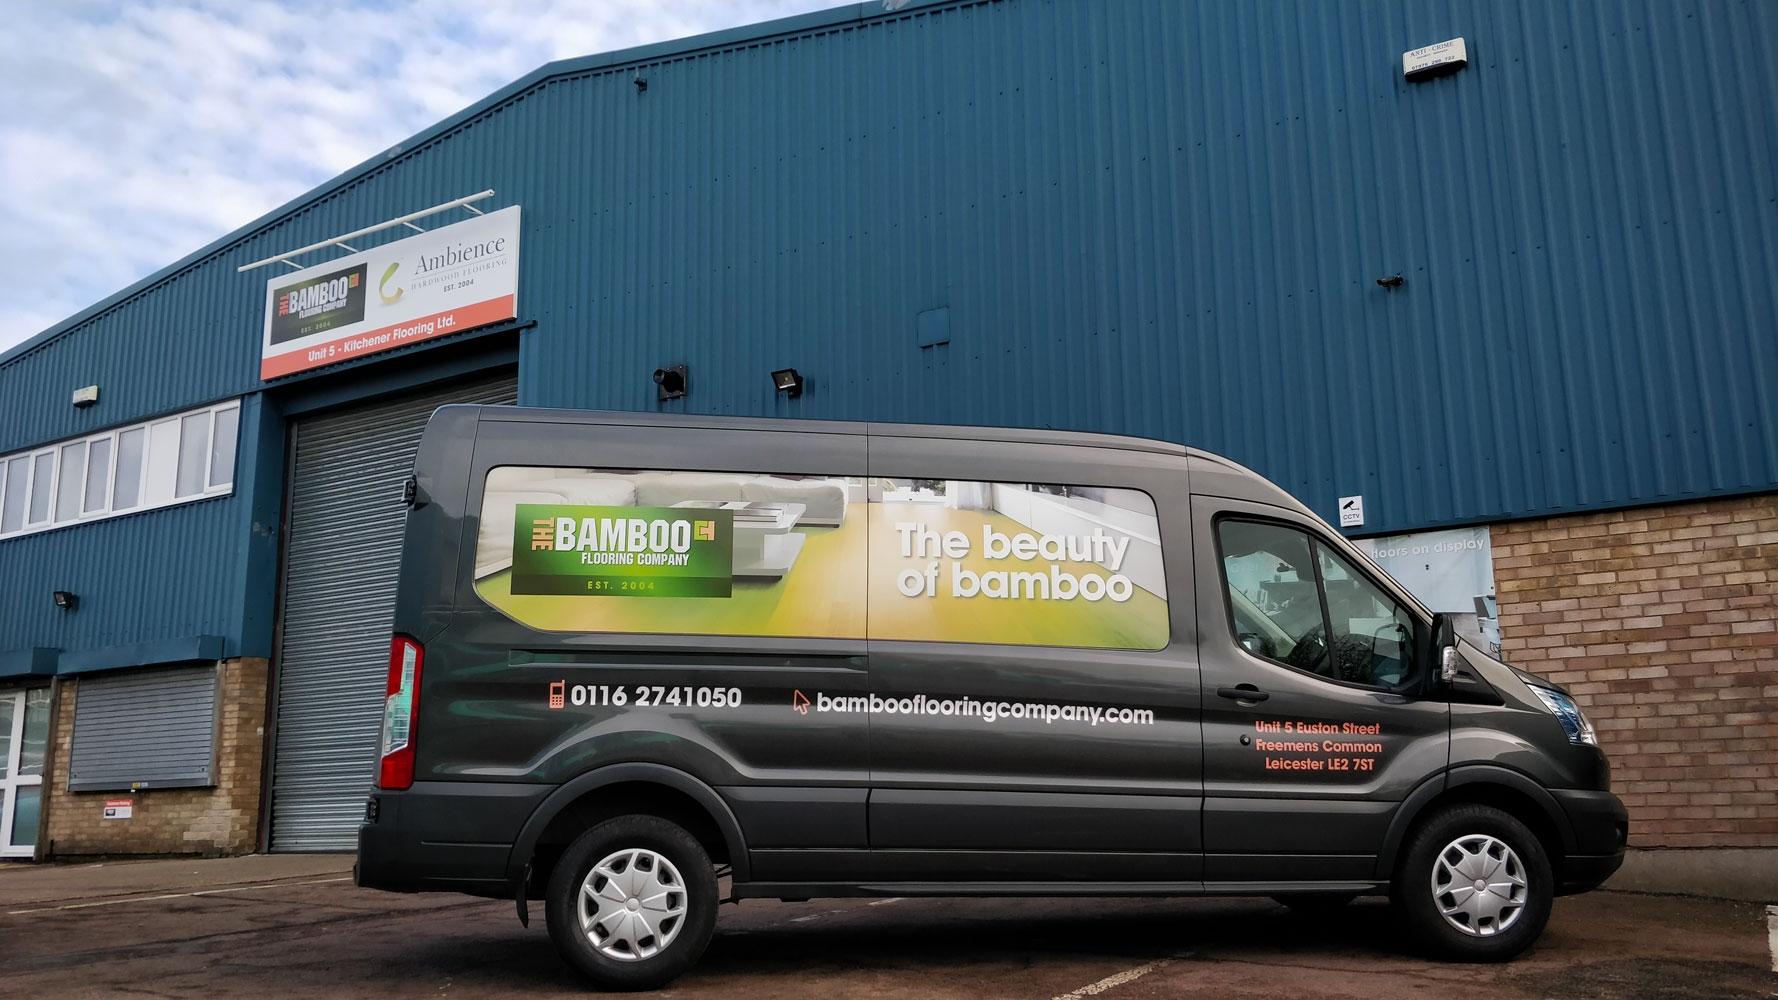 Bamboo Flooring Building and Van